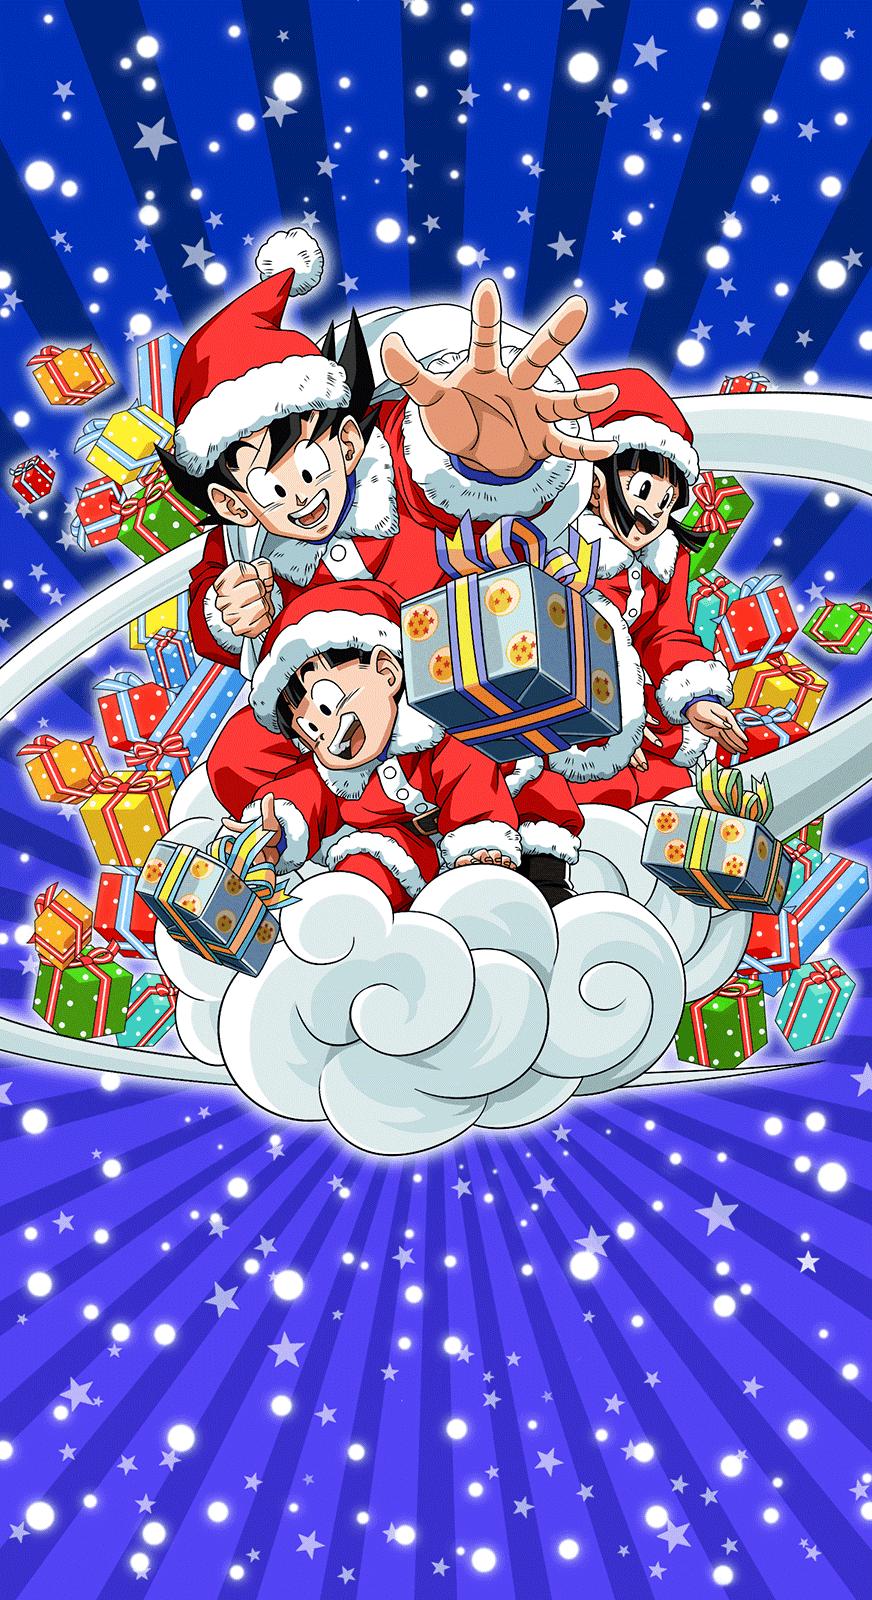 New Christmas Wallpaper For Dokkan Home Screen Fandom